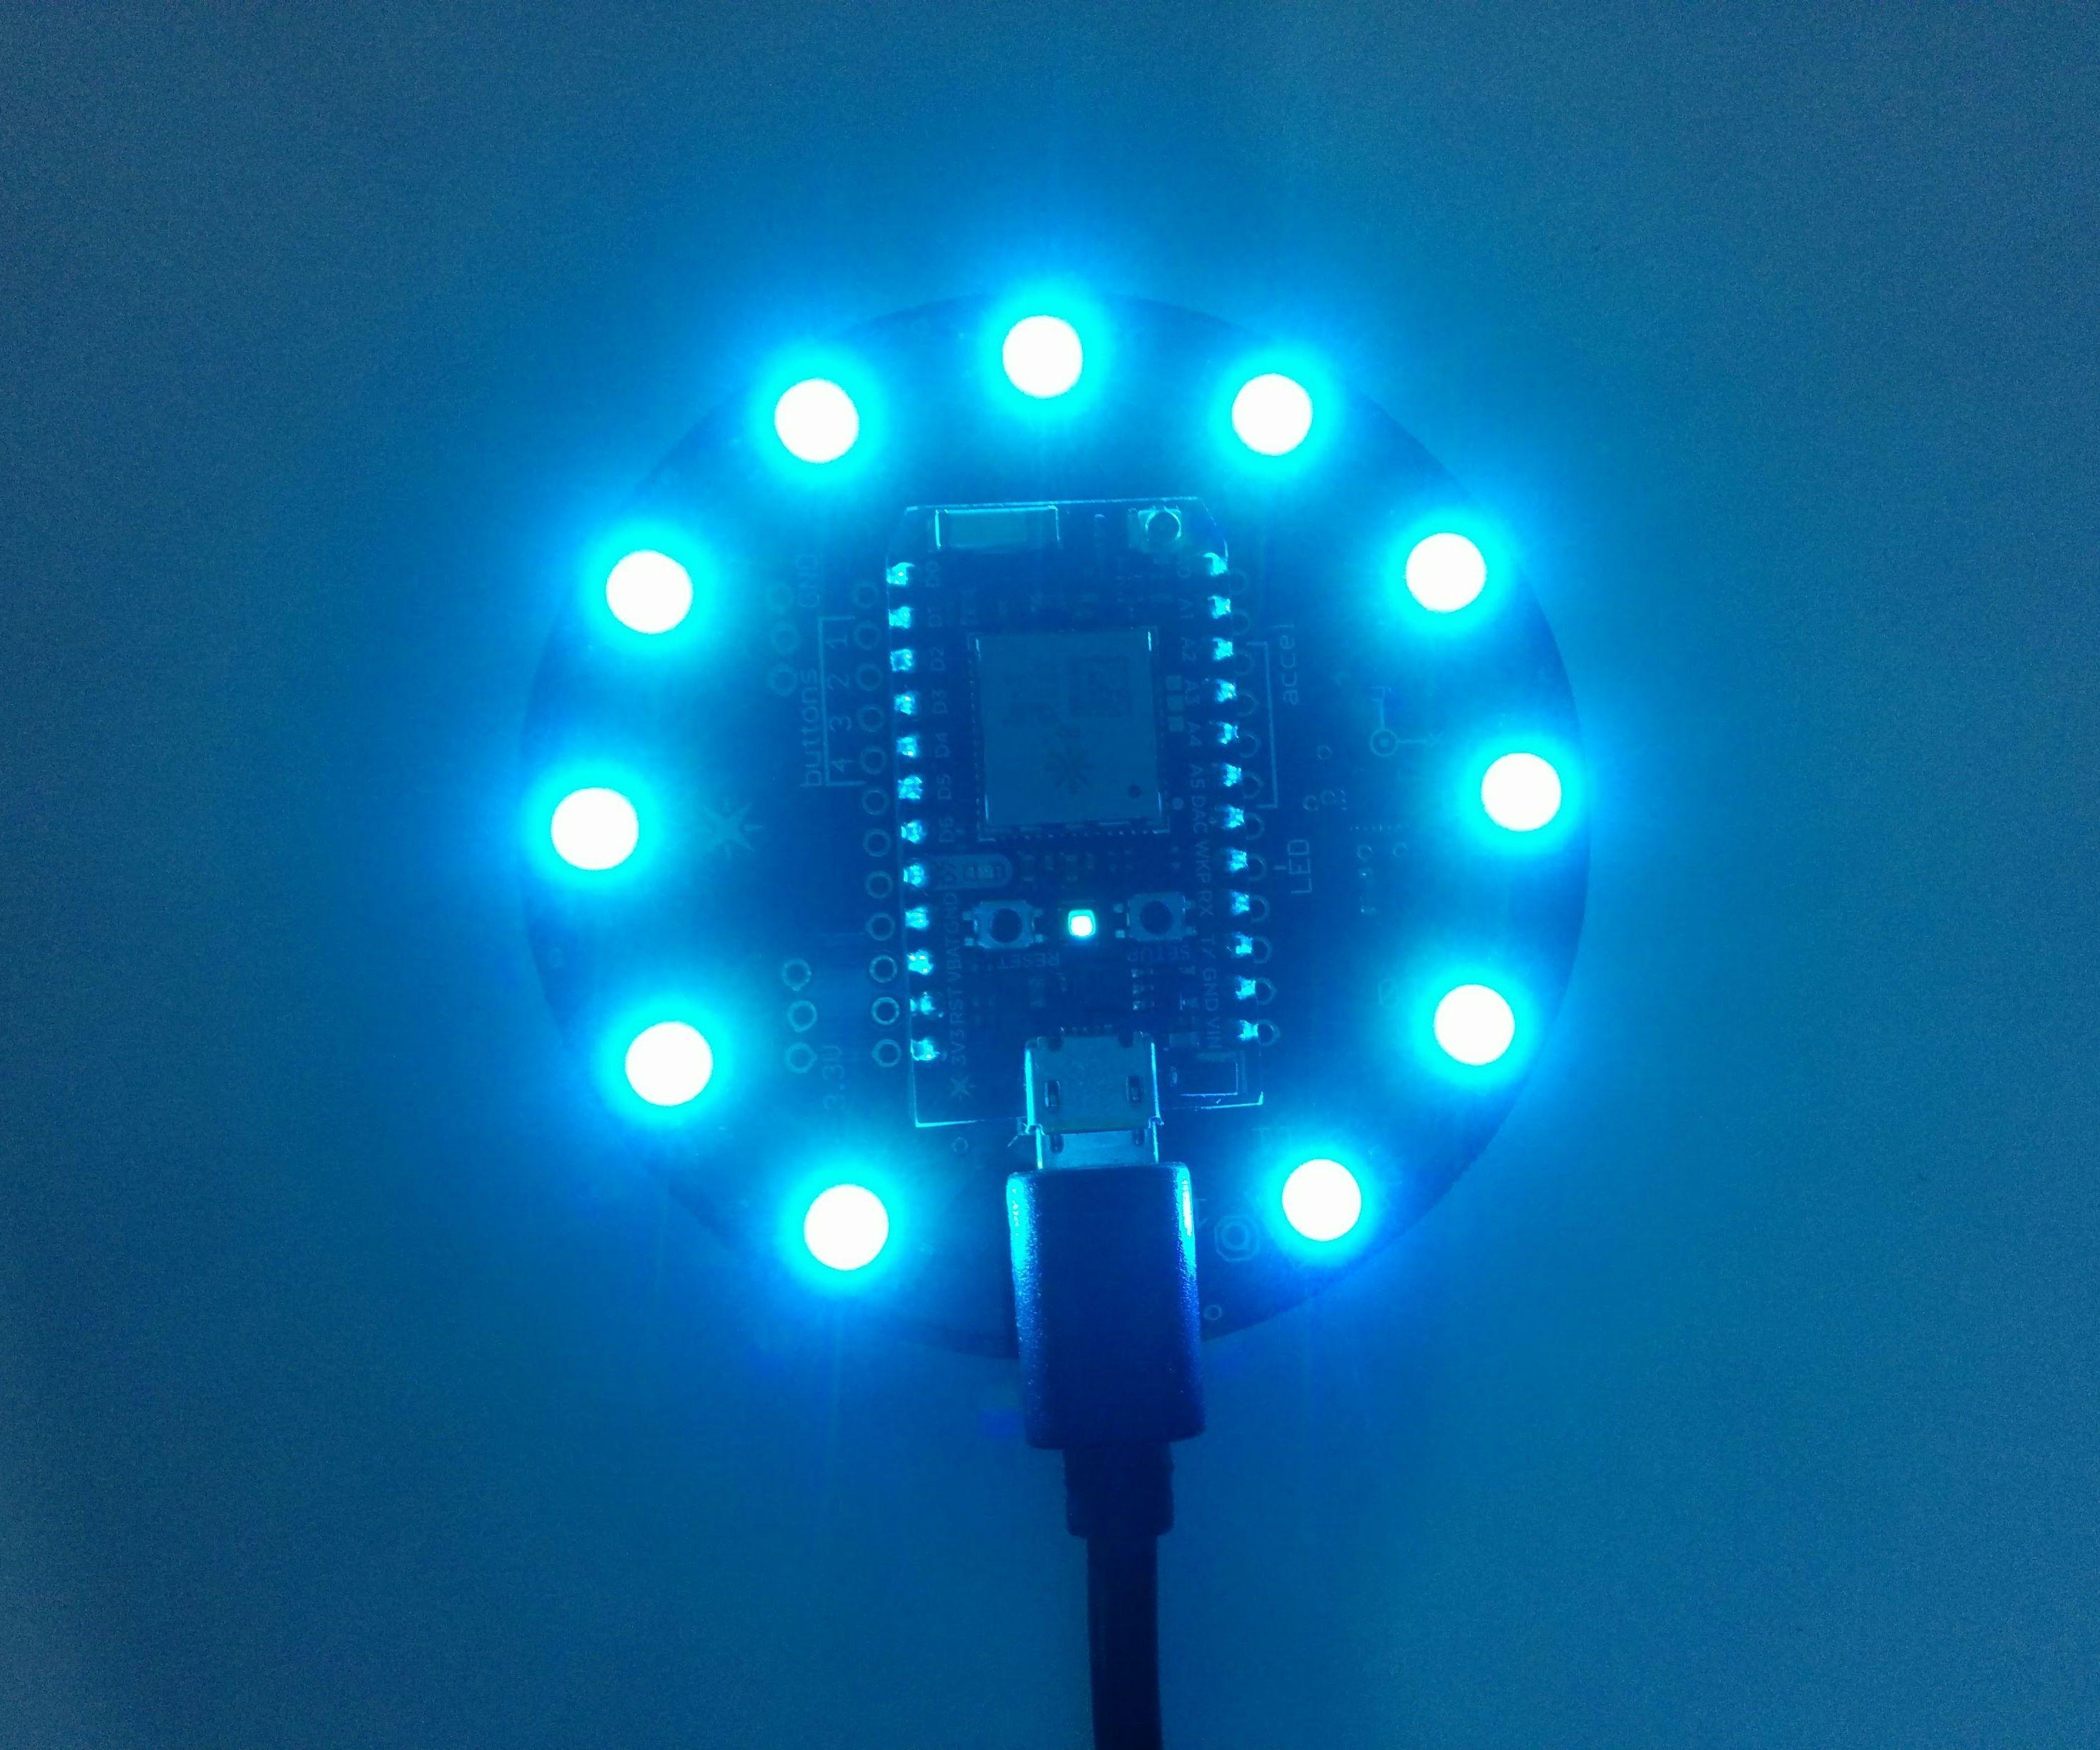 Particle Photon: Internet Button (Notification Lamp)